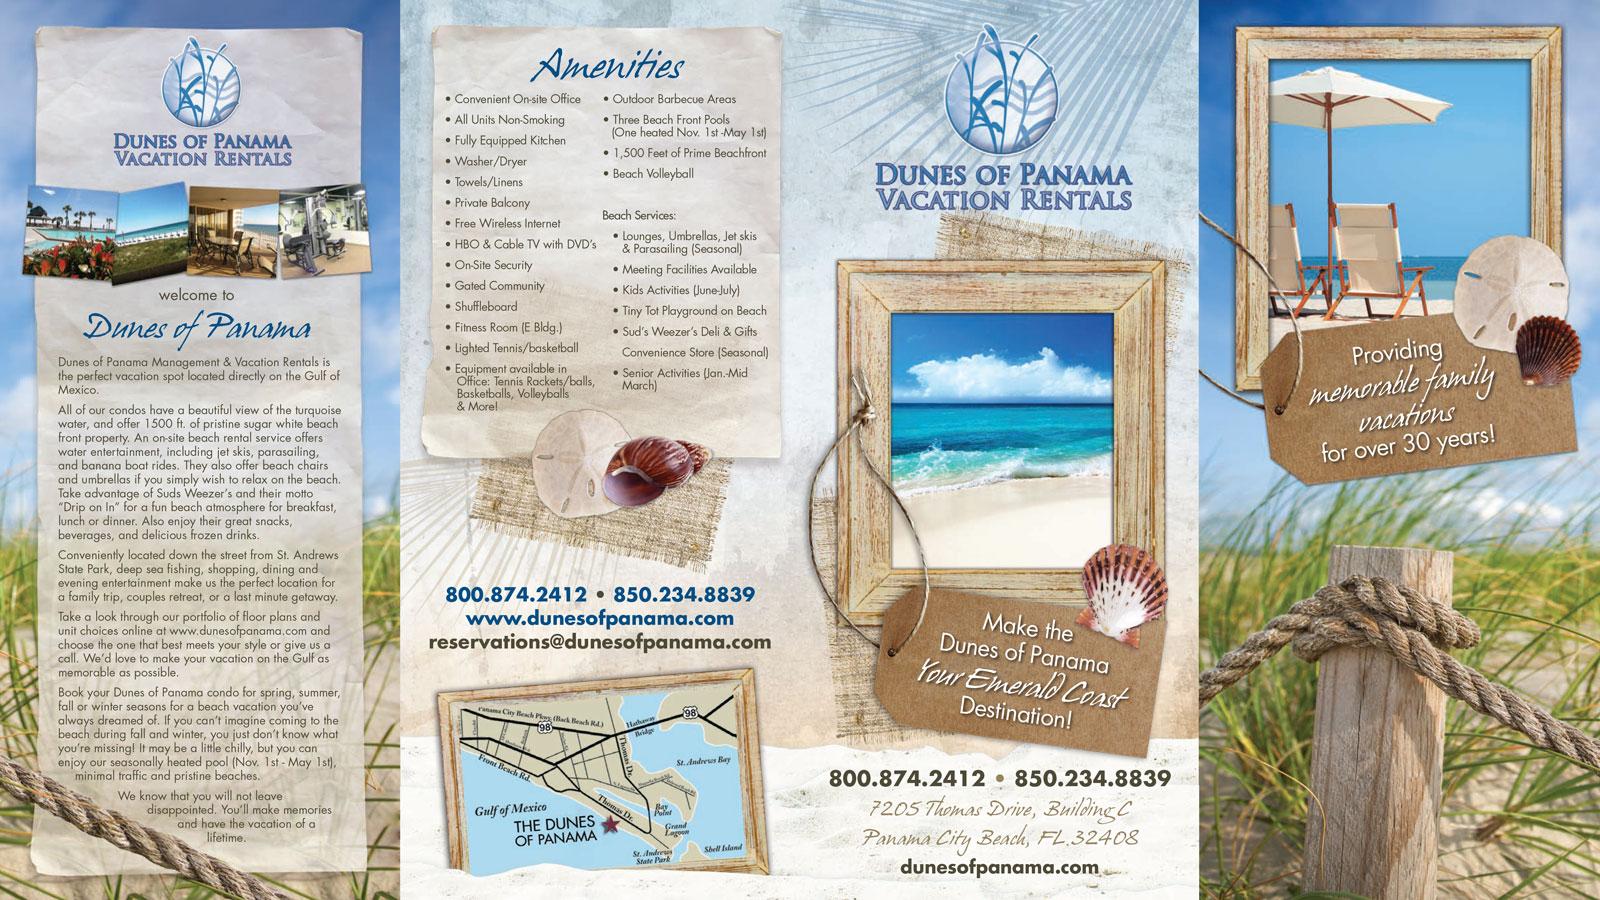 The Dunes of Panama Vacation Rentals Brochure